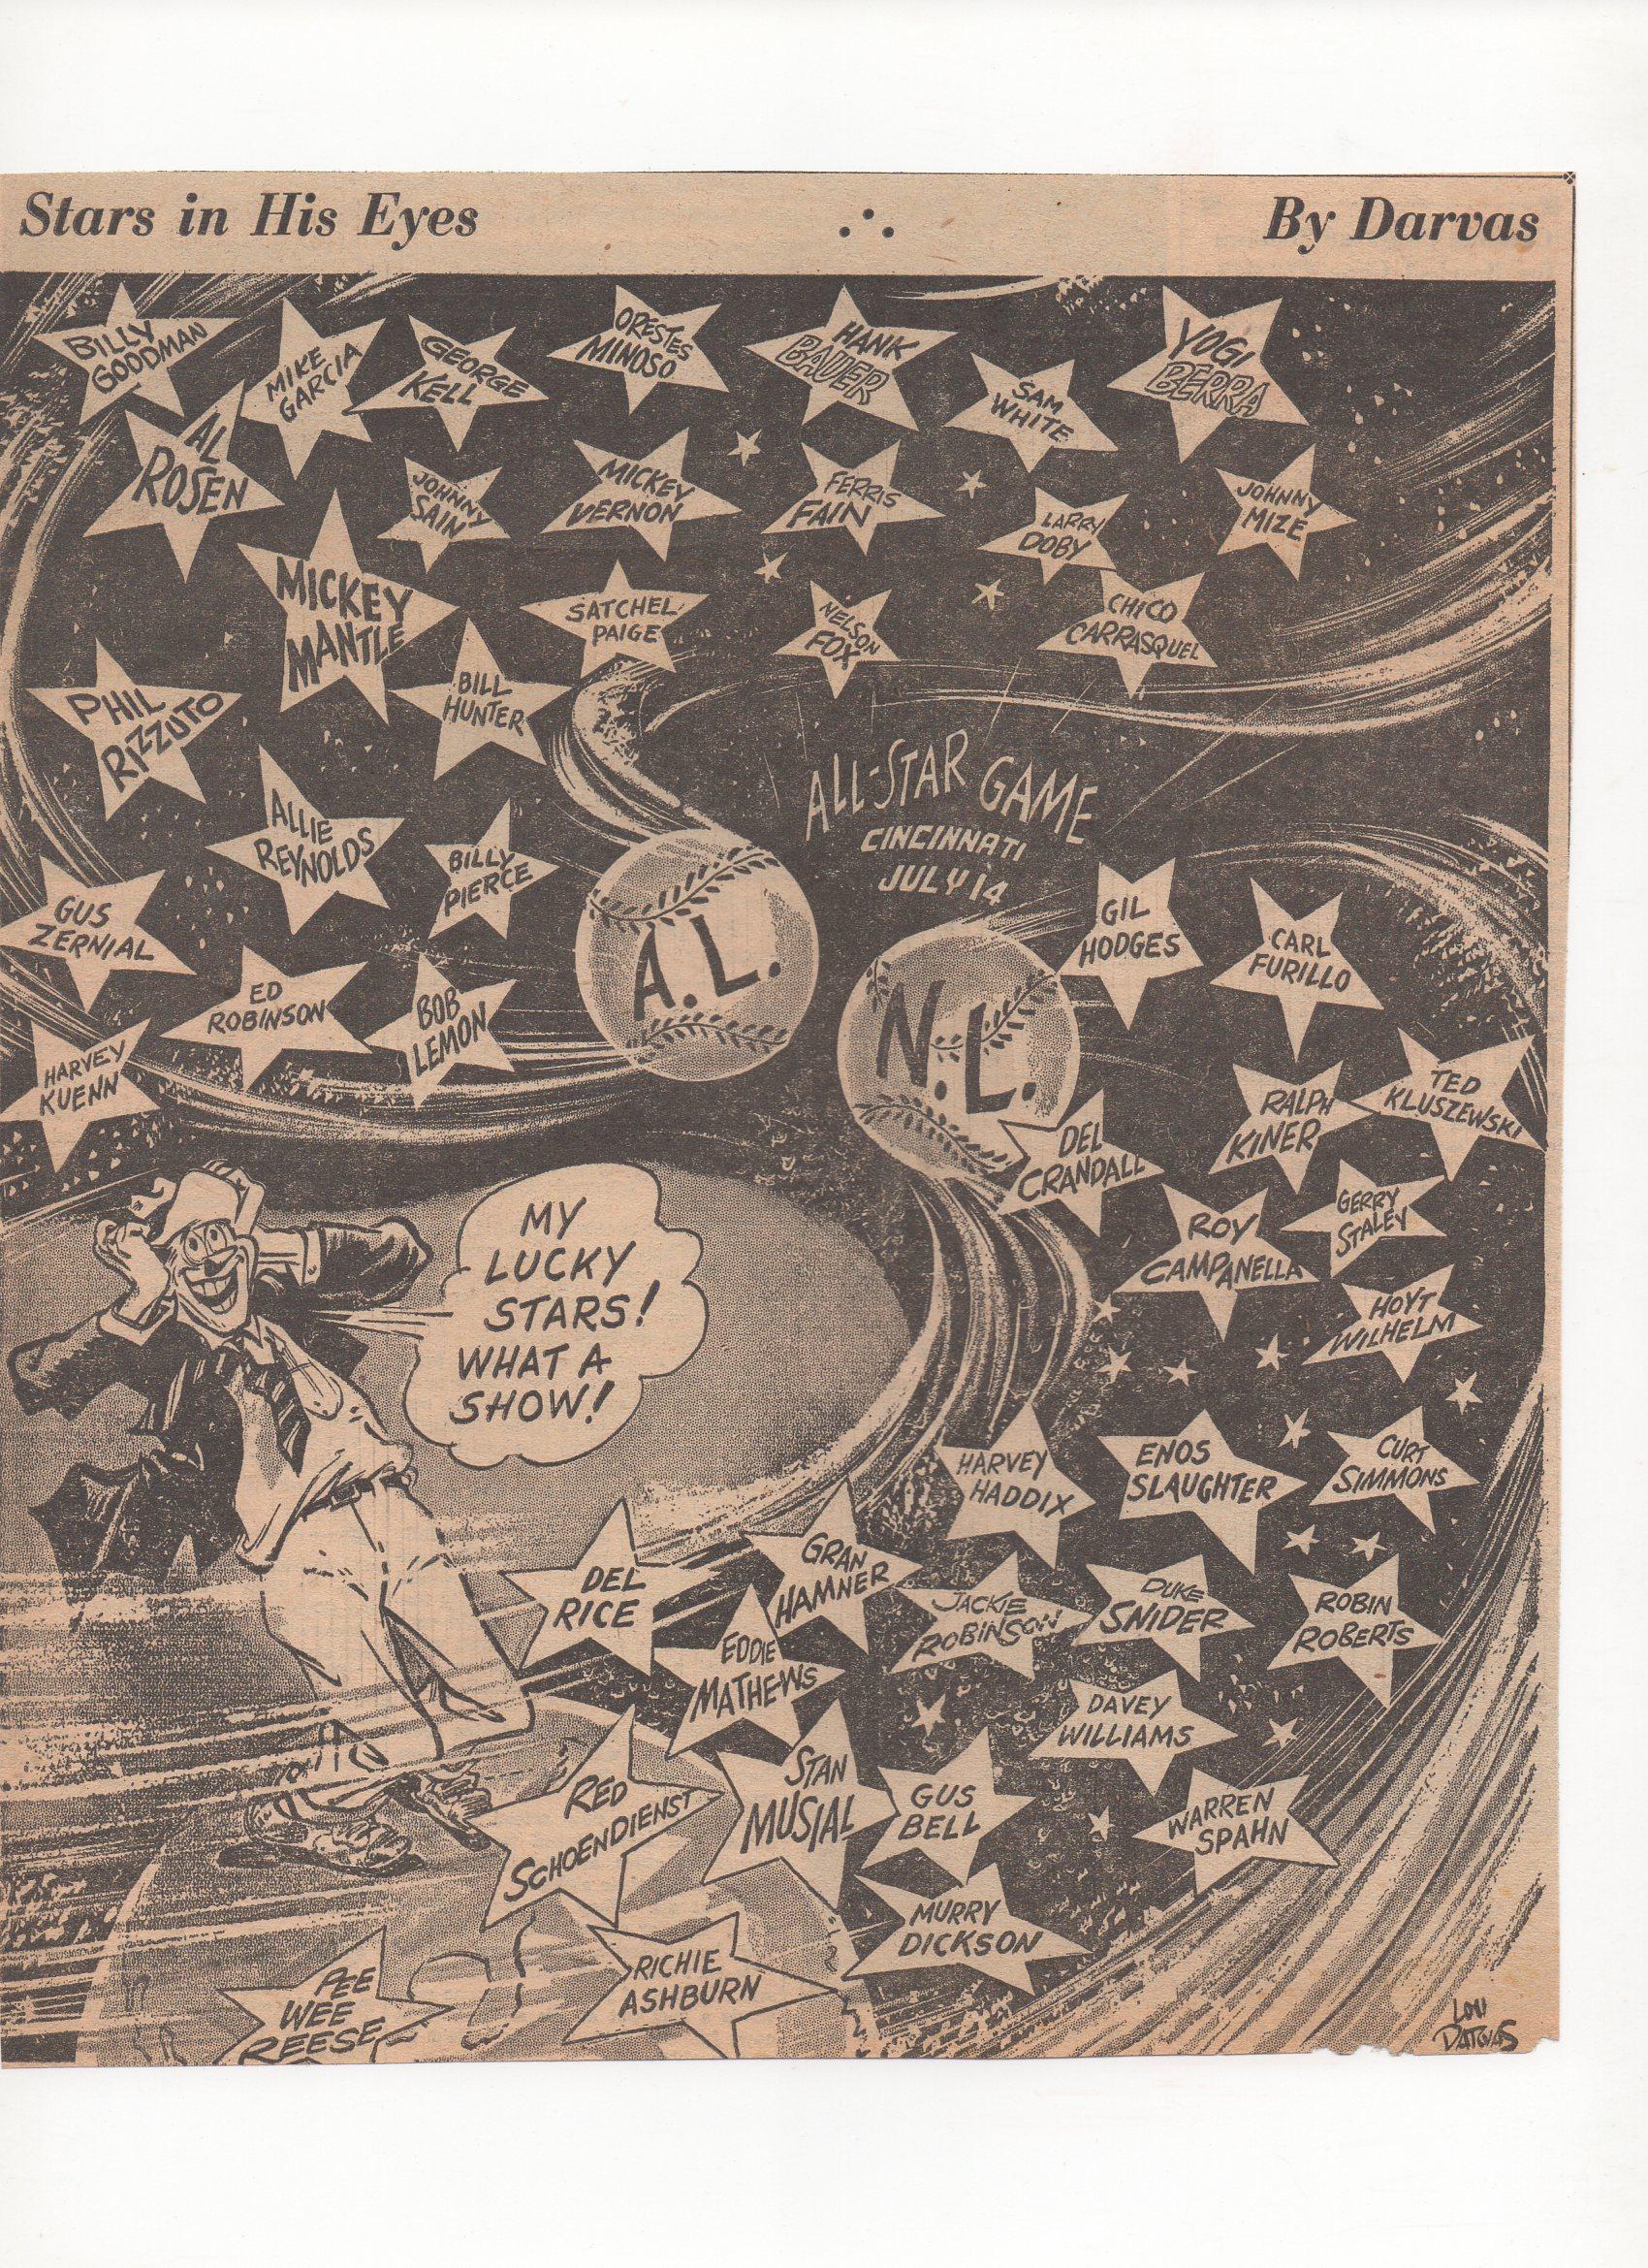 1953 sporting news